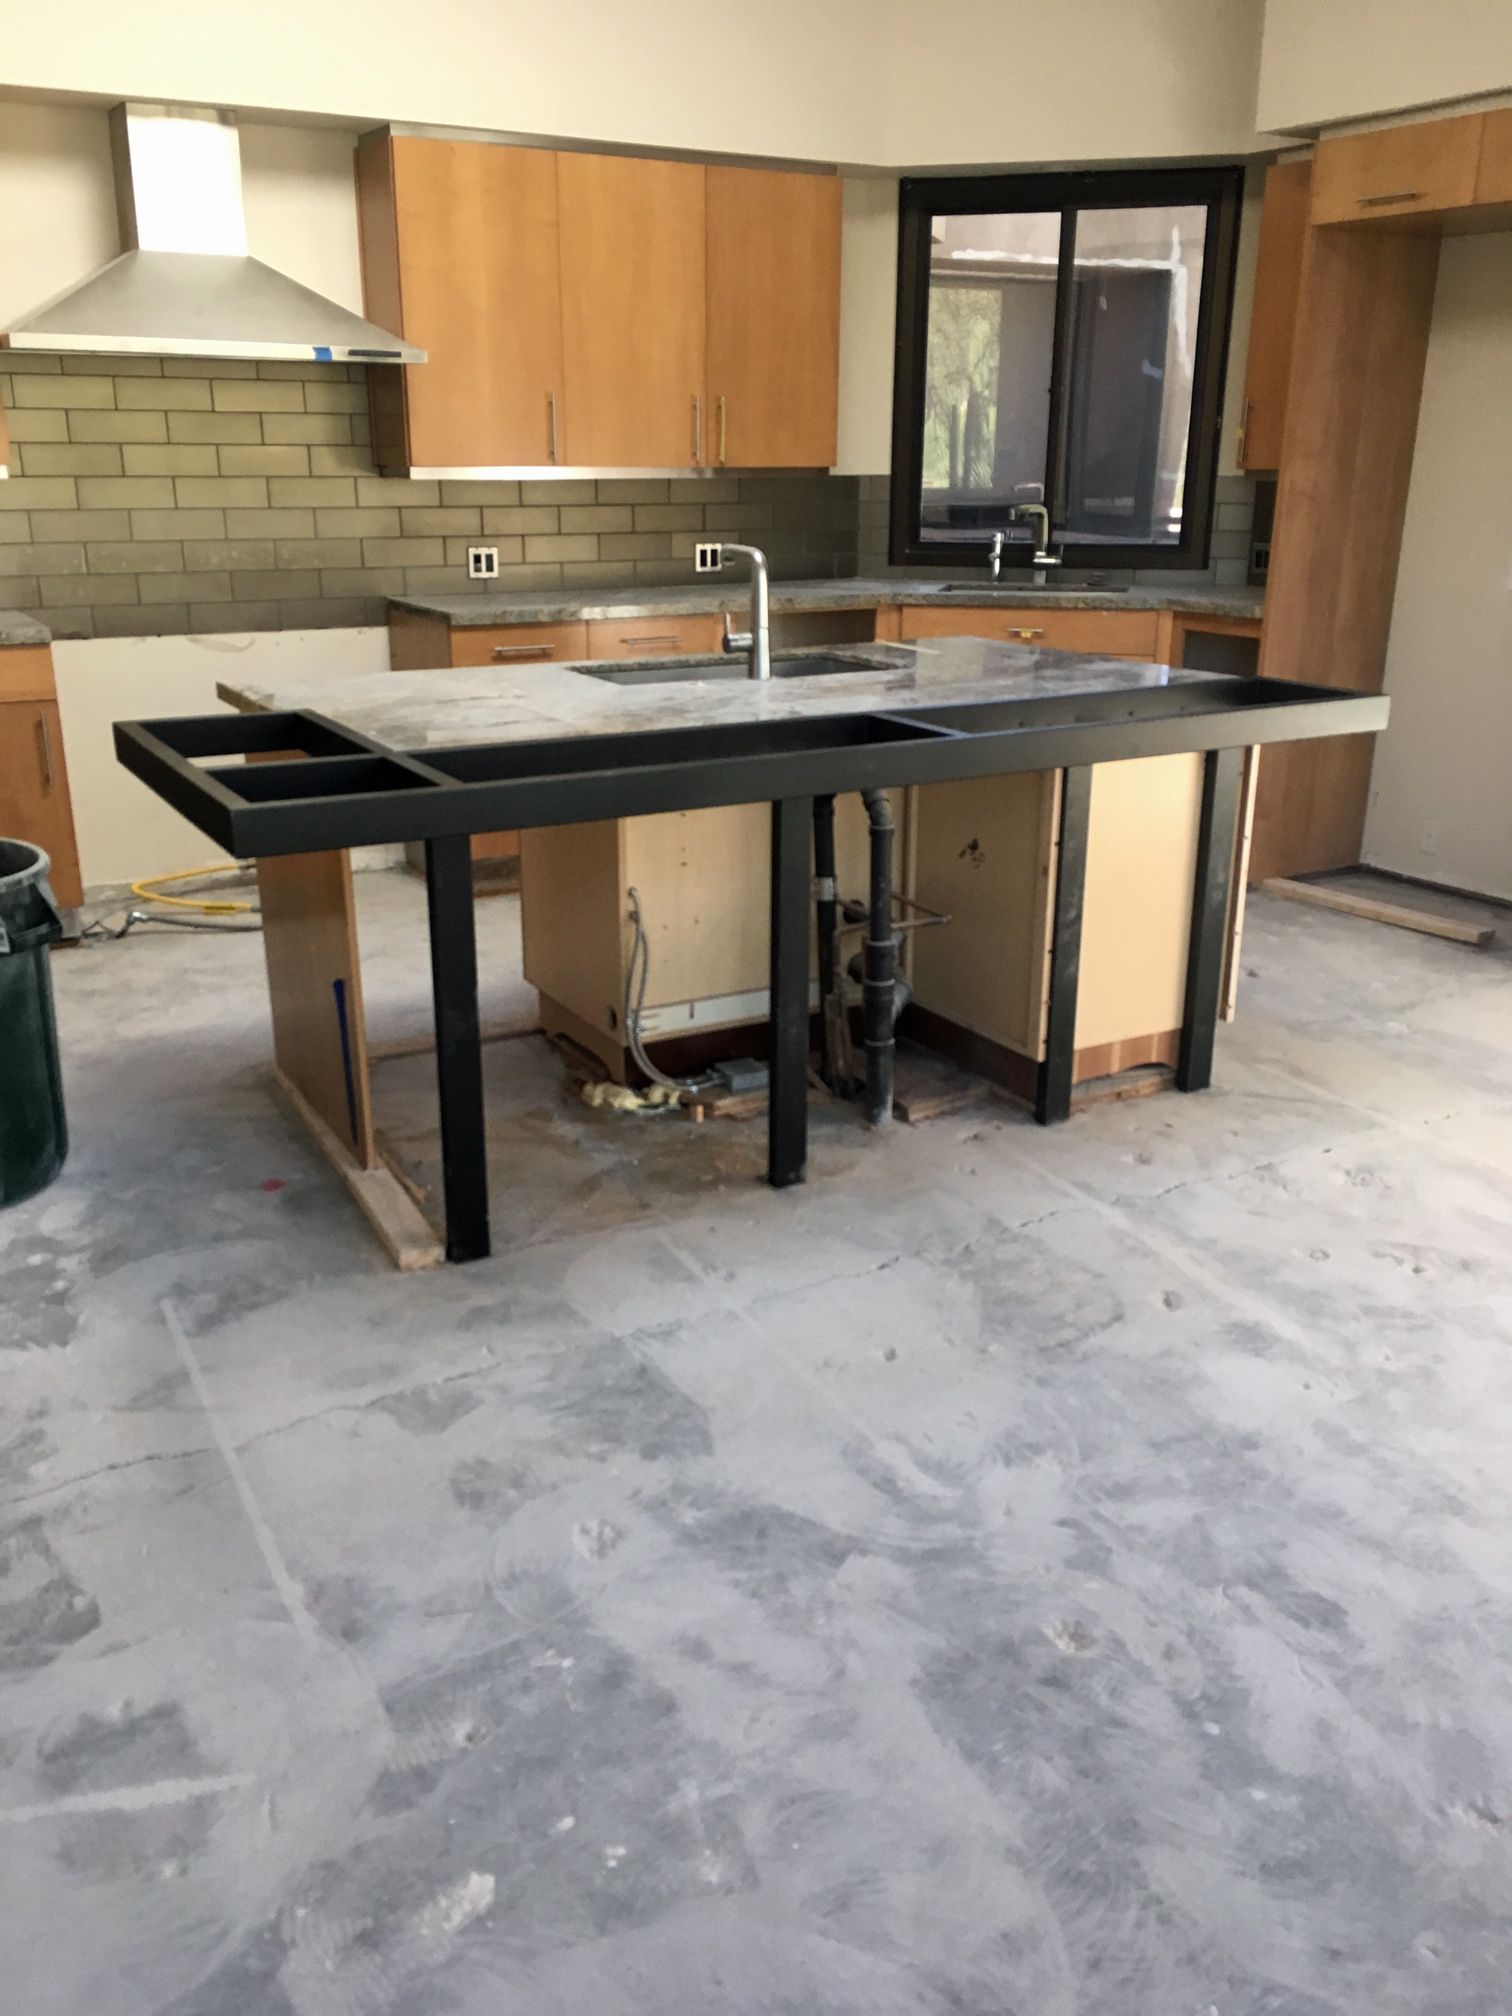 Peachy Kitchen Island Support Frame Milestone Homes Kitchen Island Bar S kitchen Kitchen Island Bar Top